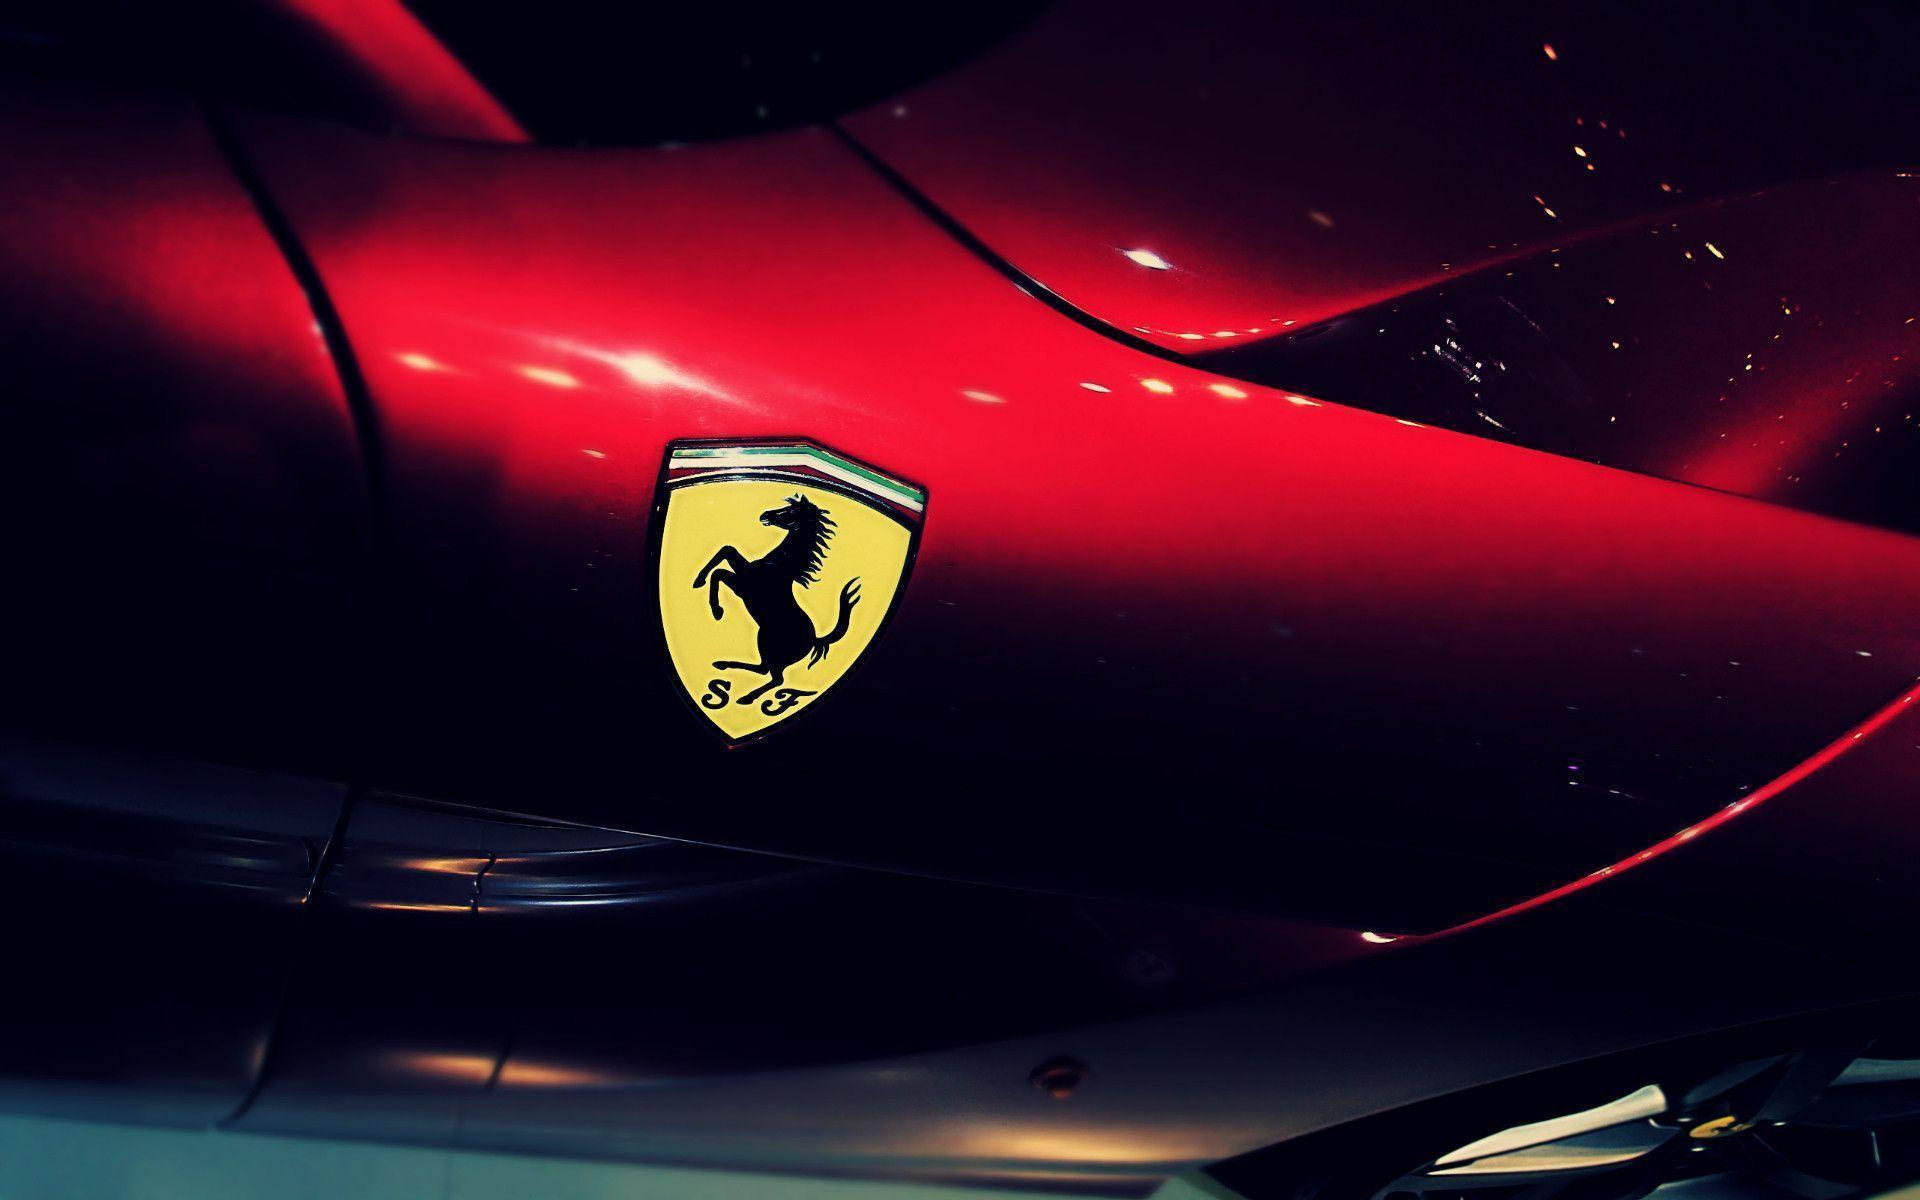 Ferrari Wallpapers On Wallpaperdog